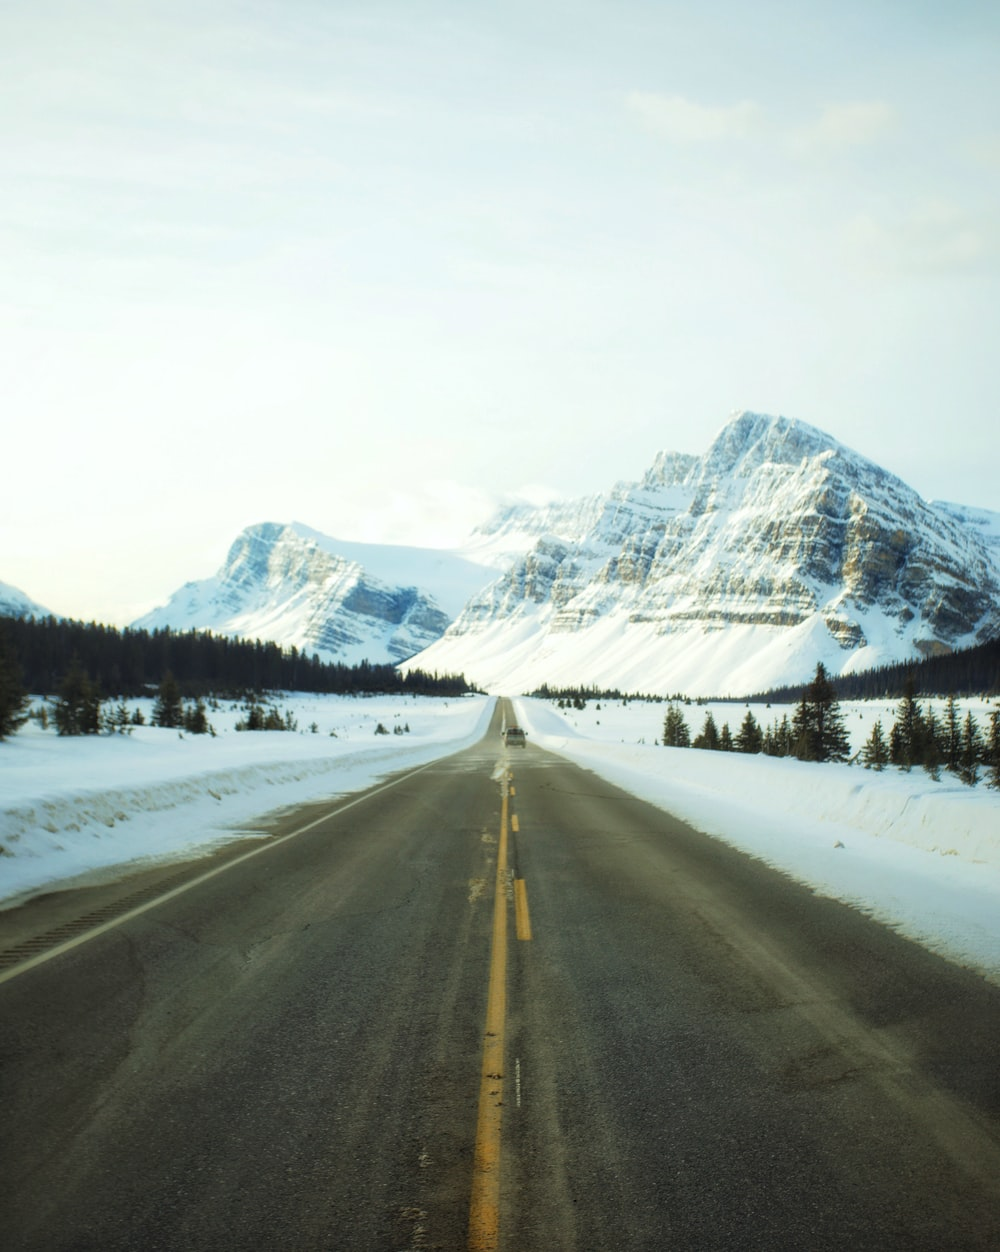 road leading towards snowy mountain